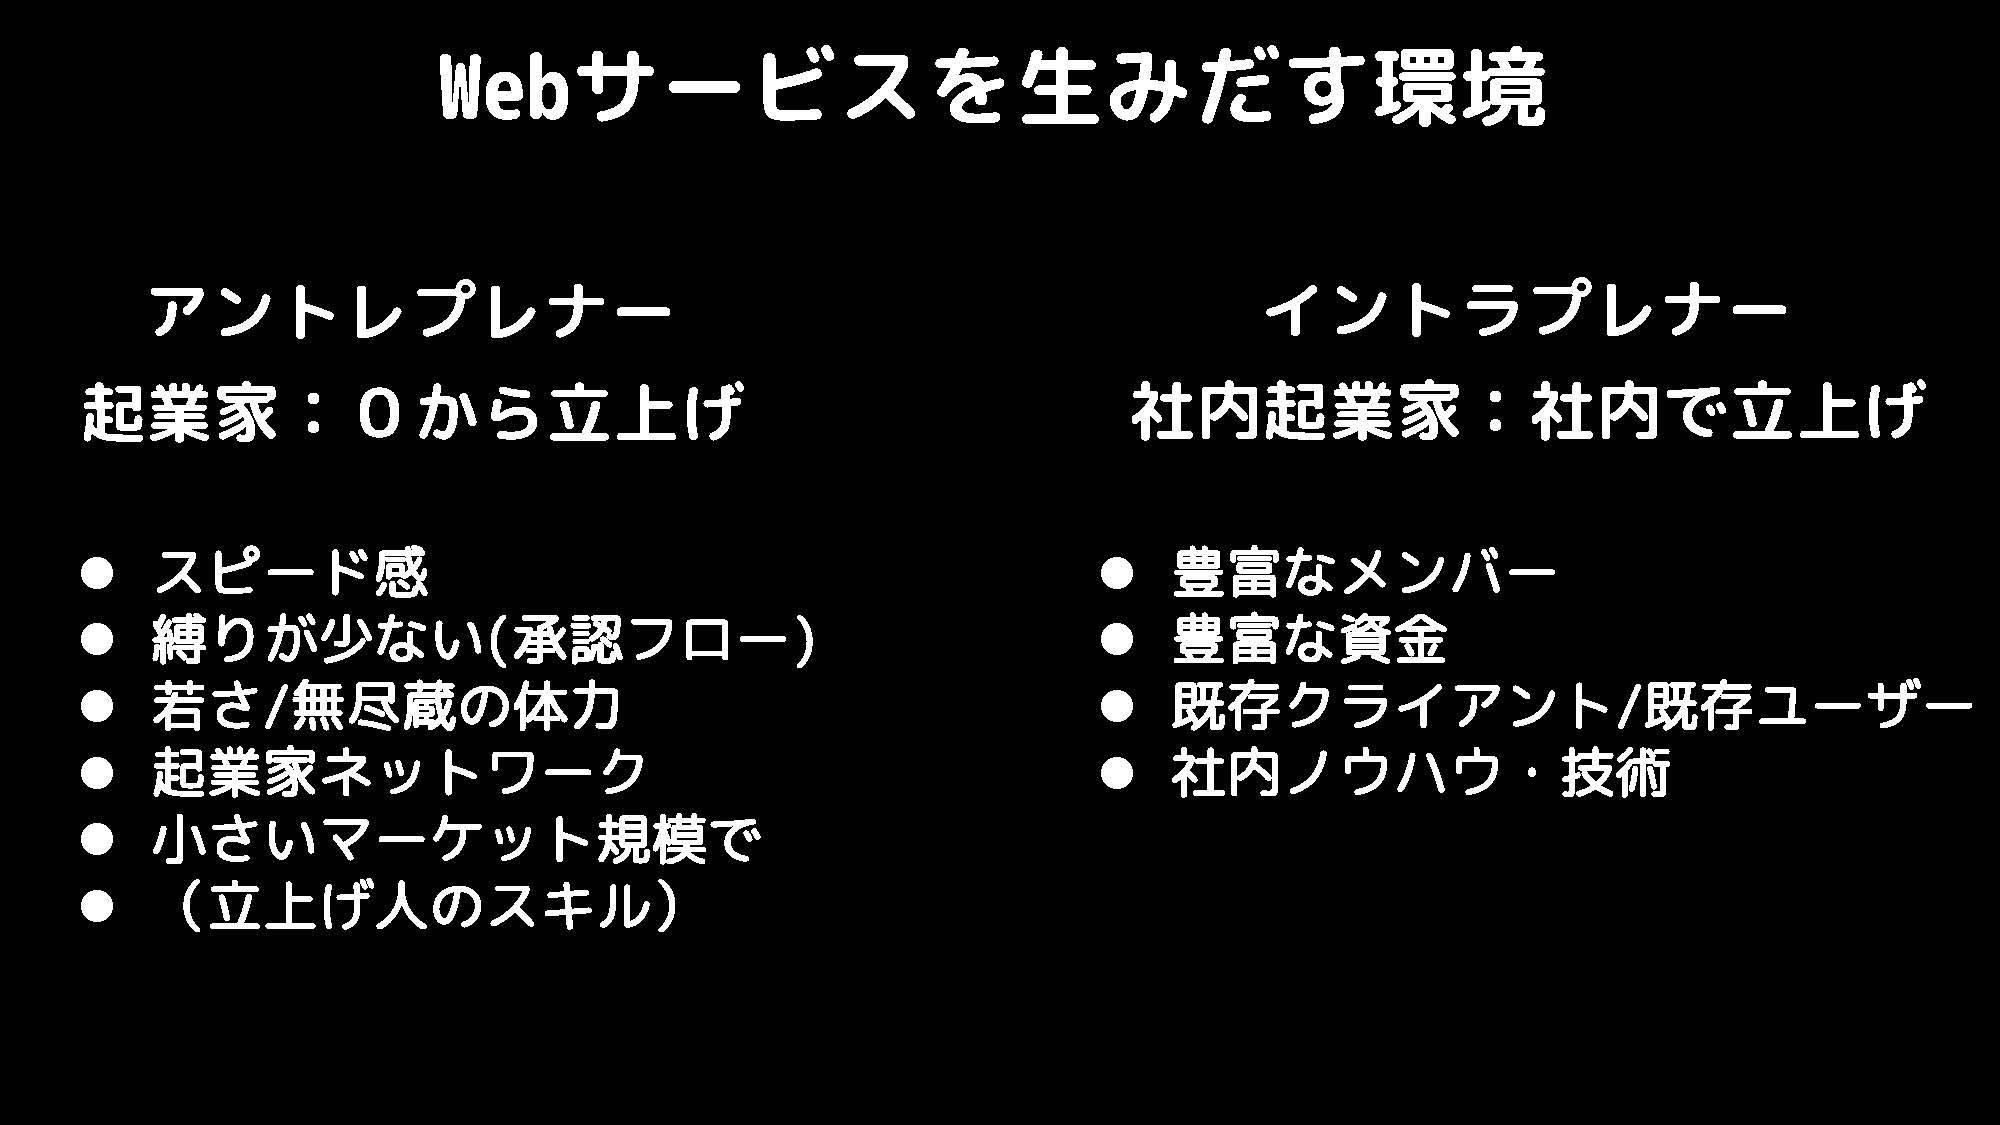 web-160911152159_%e3%83%9a%e3%83%bc%e3%82%b8_56